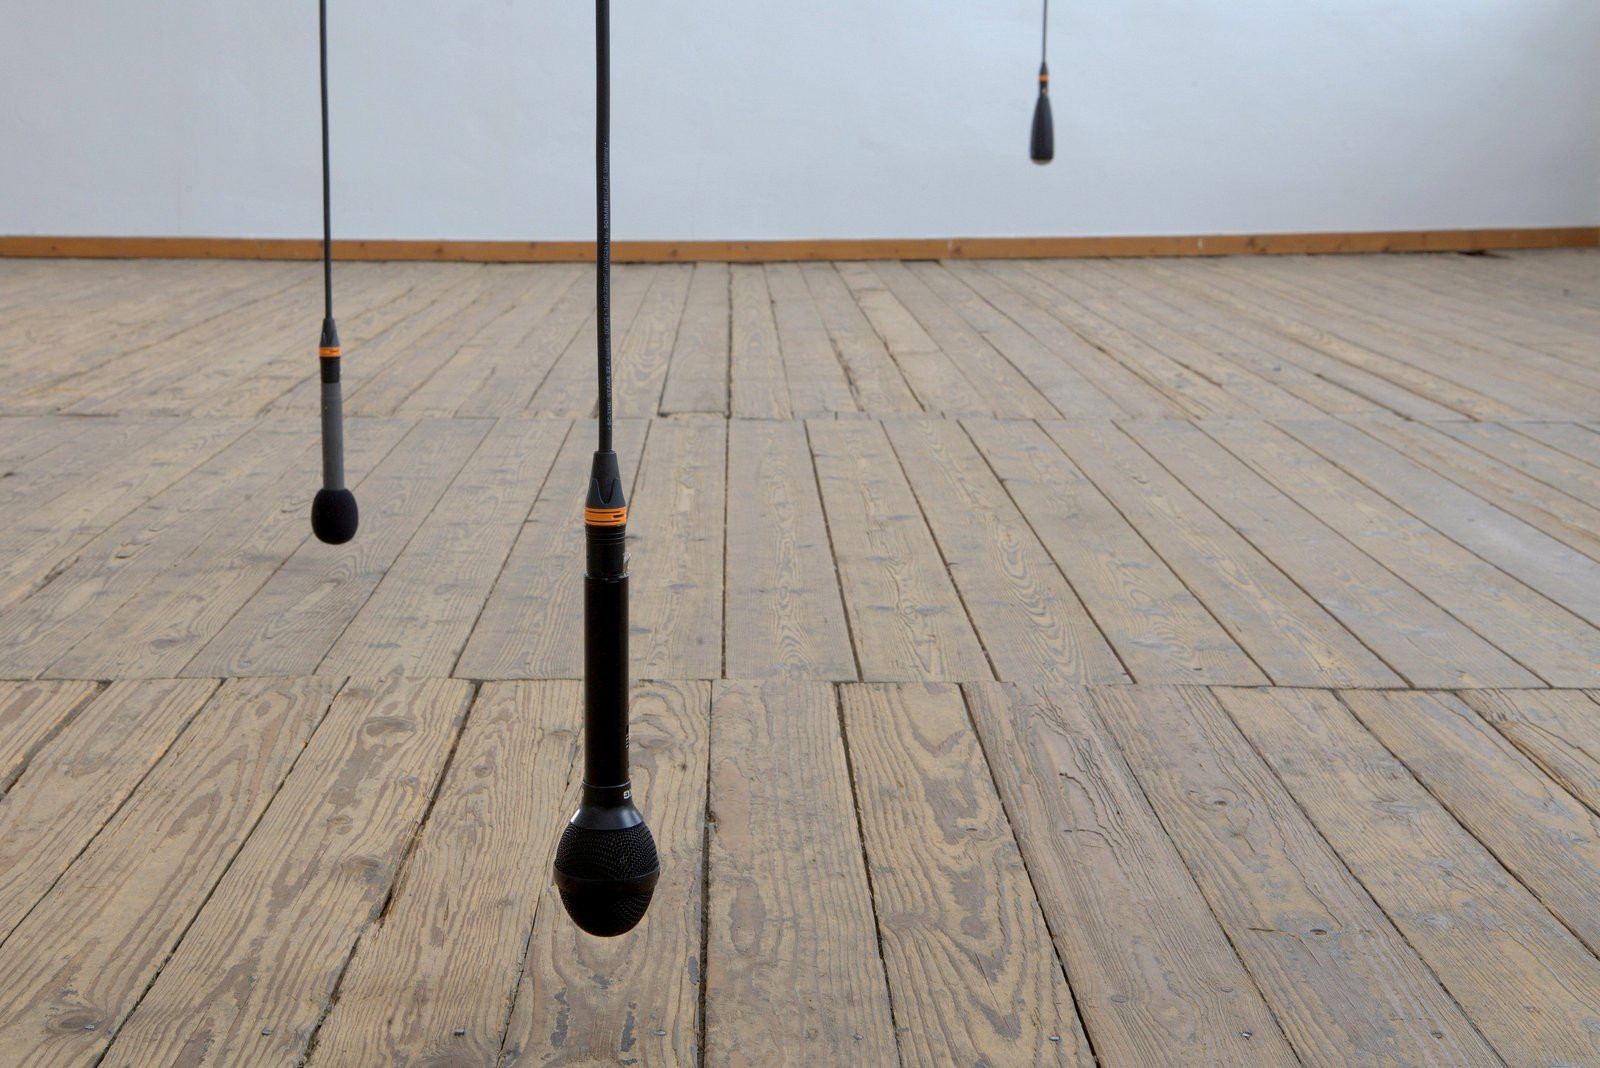 2. Stock, 2. Raum, Eckhard Kuchenbecker und Lasse-Marc Riek, Wood